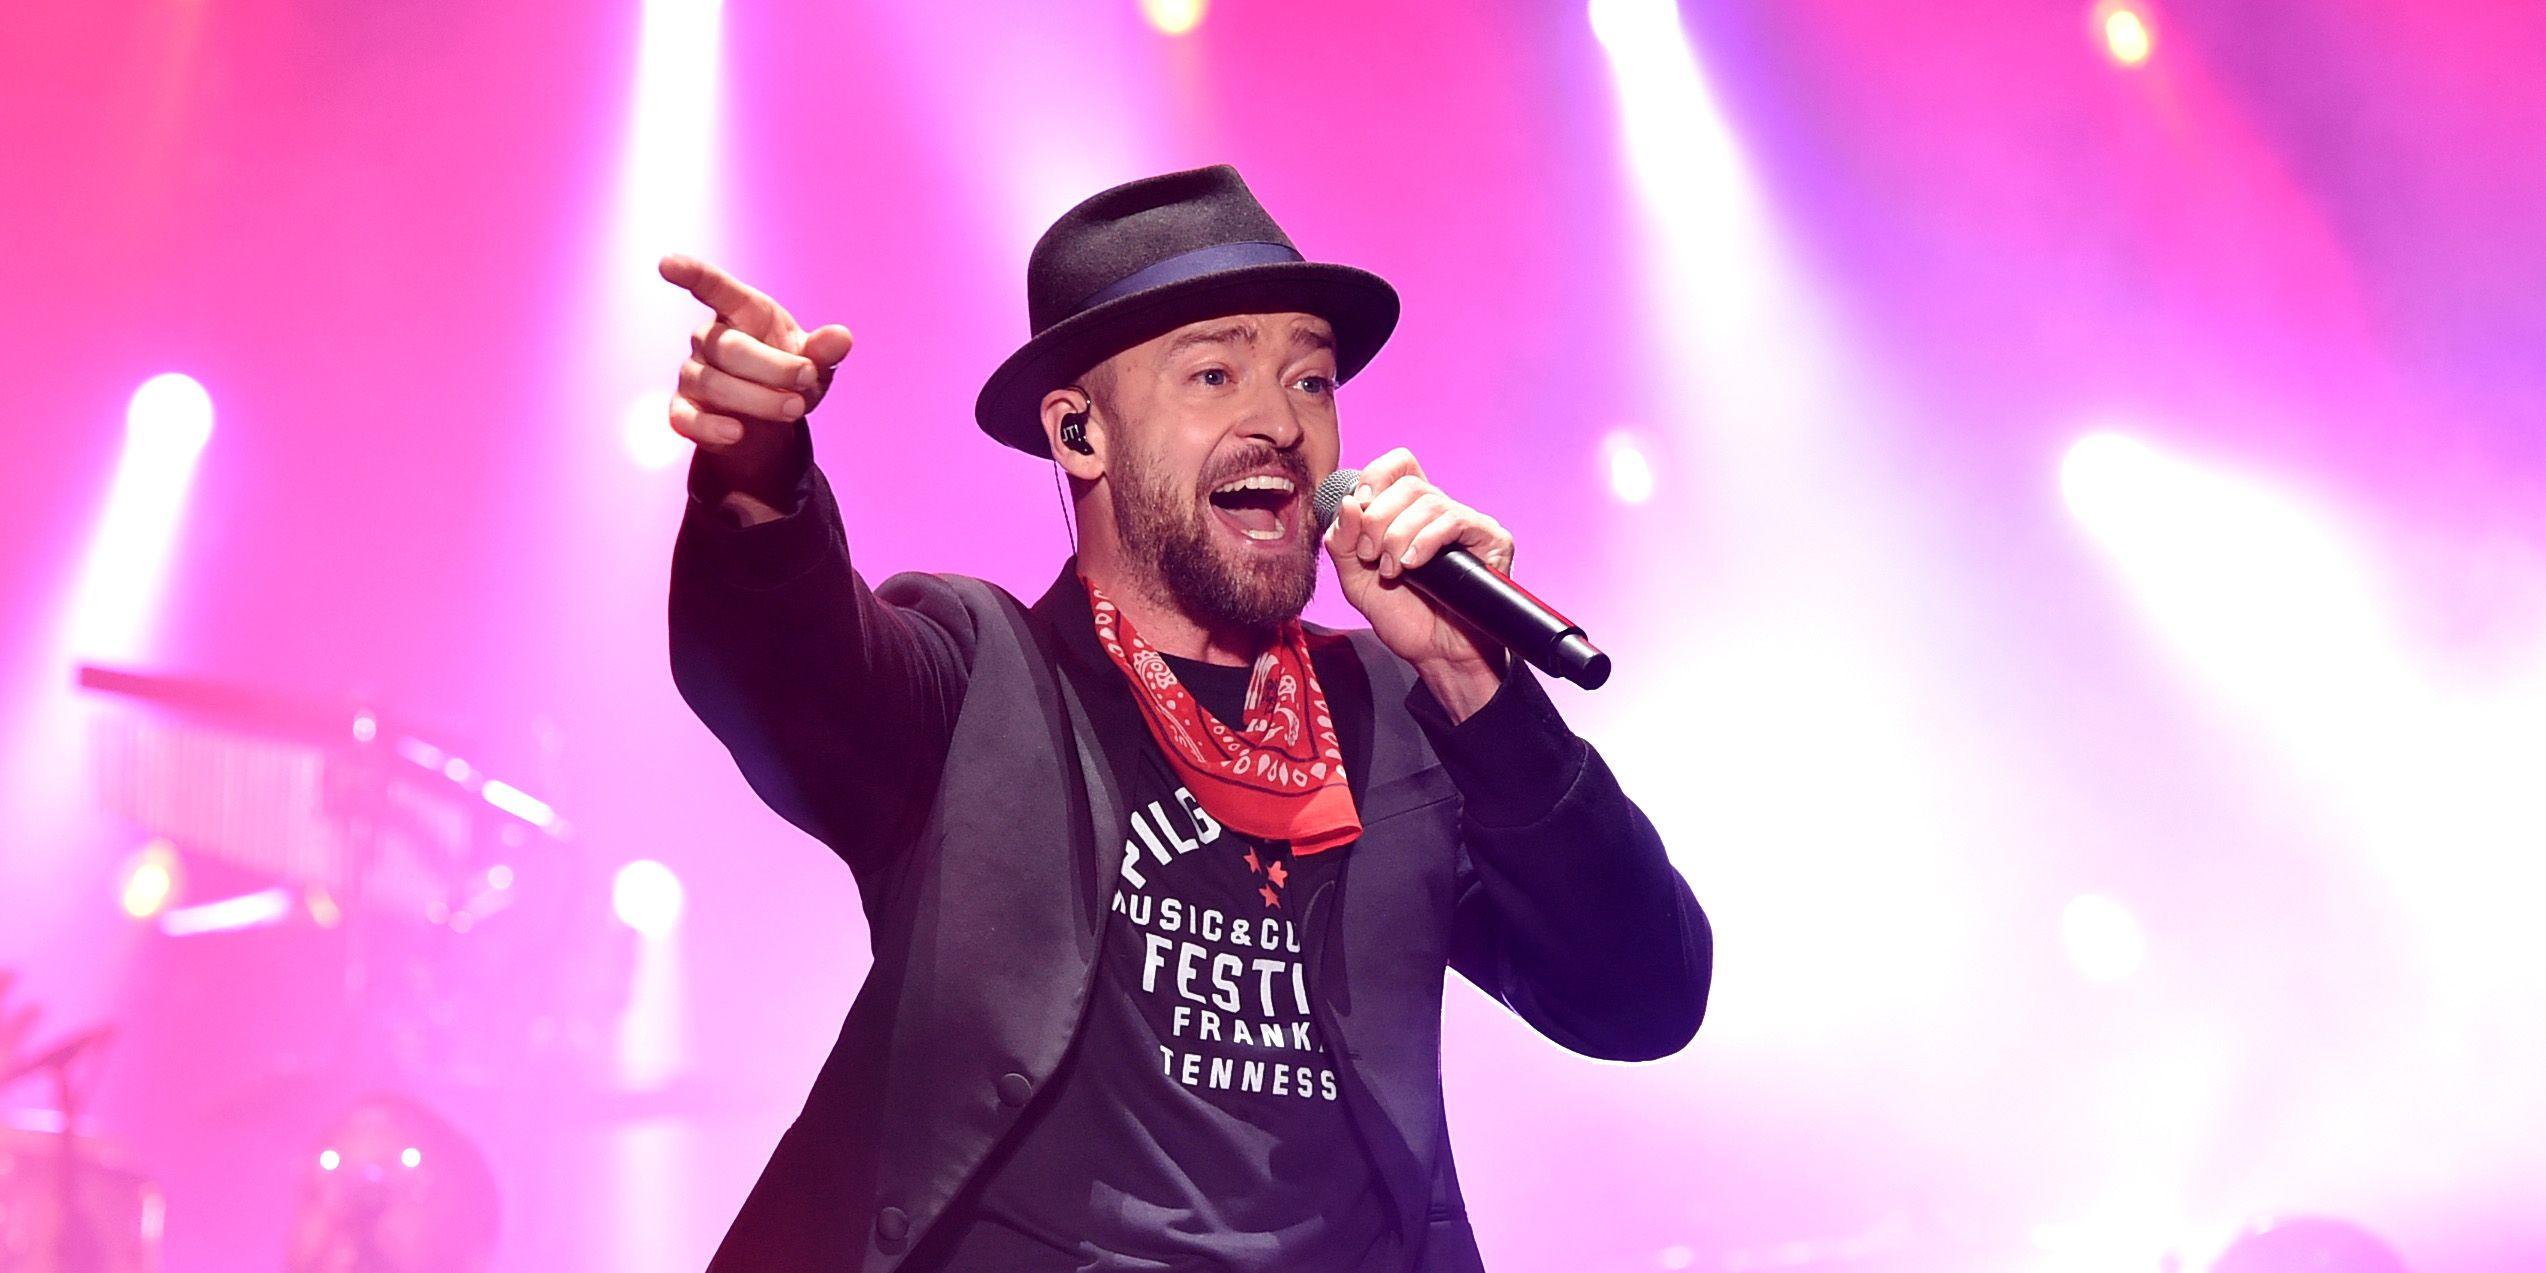 Justin Timberlake performs at the 2017 Pilgrimage Music & Cultural Festival